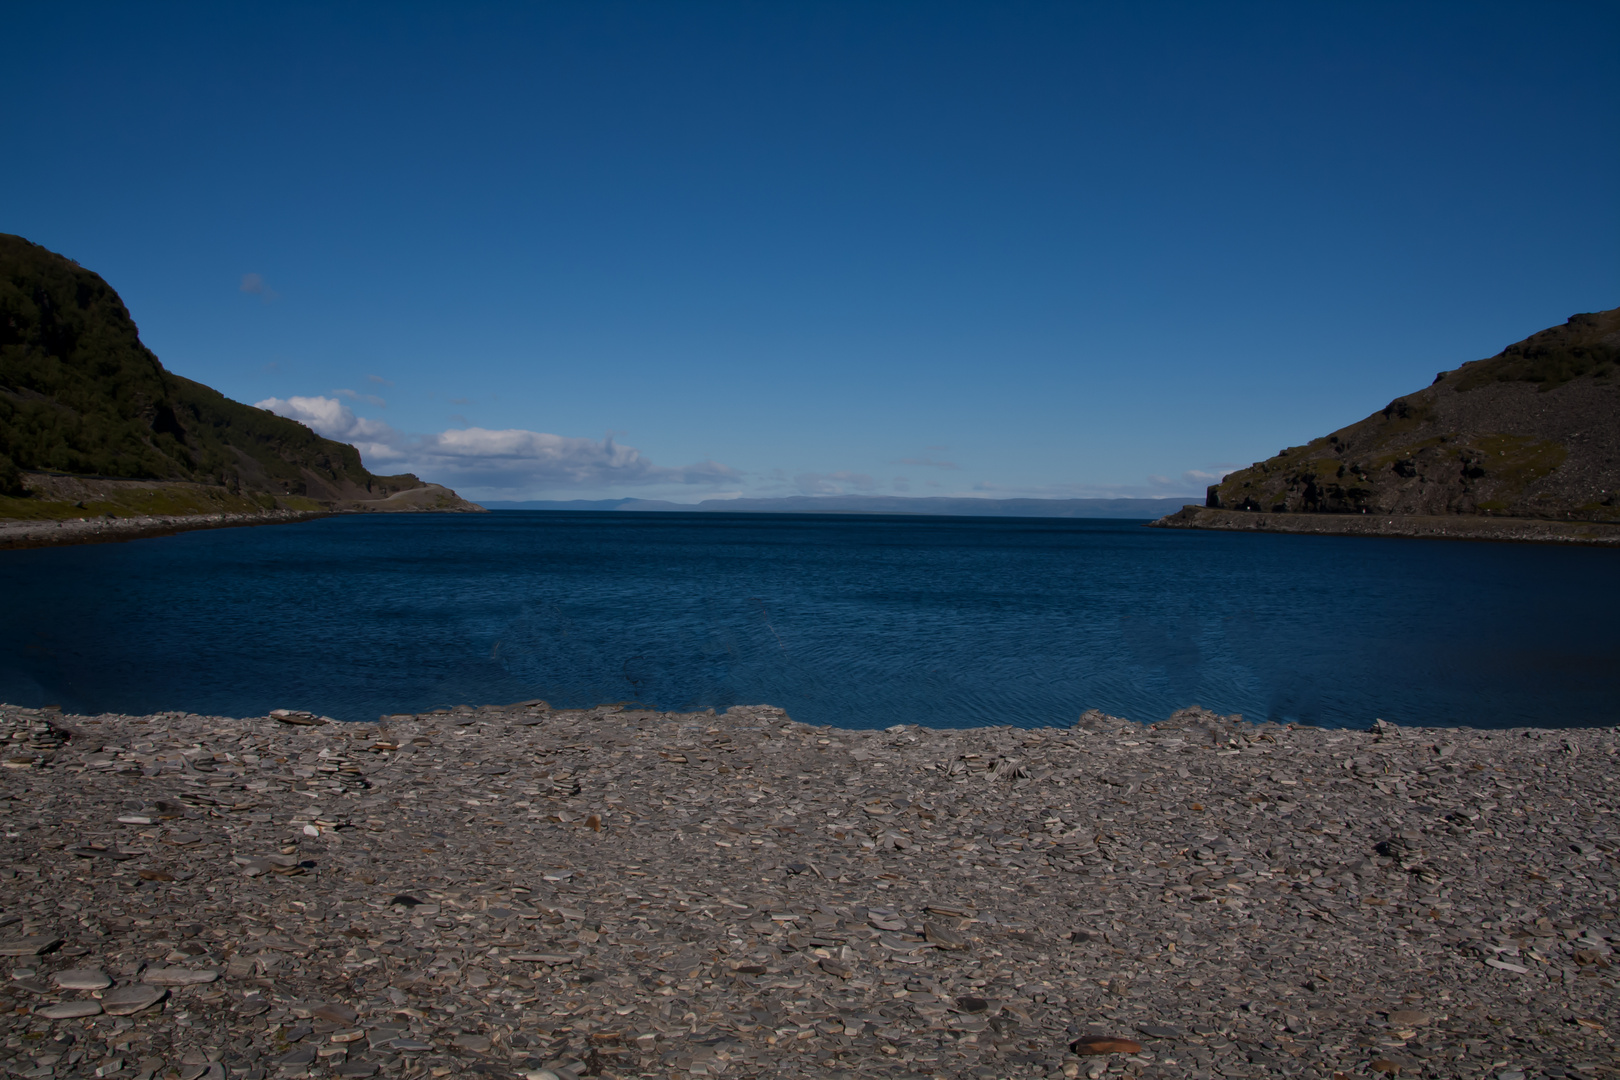 Traumwetter am Porsangenfjord